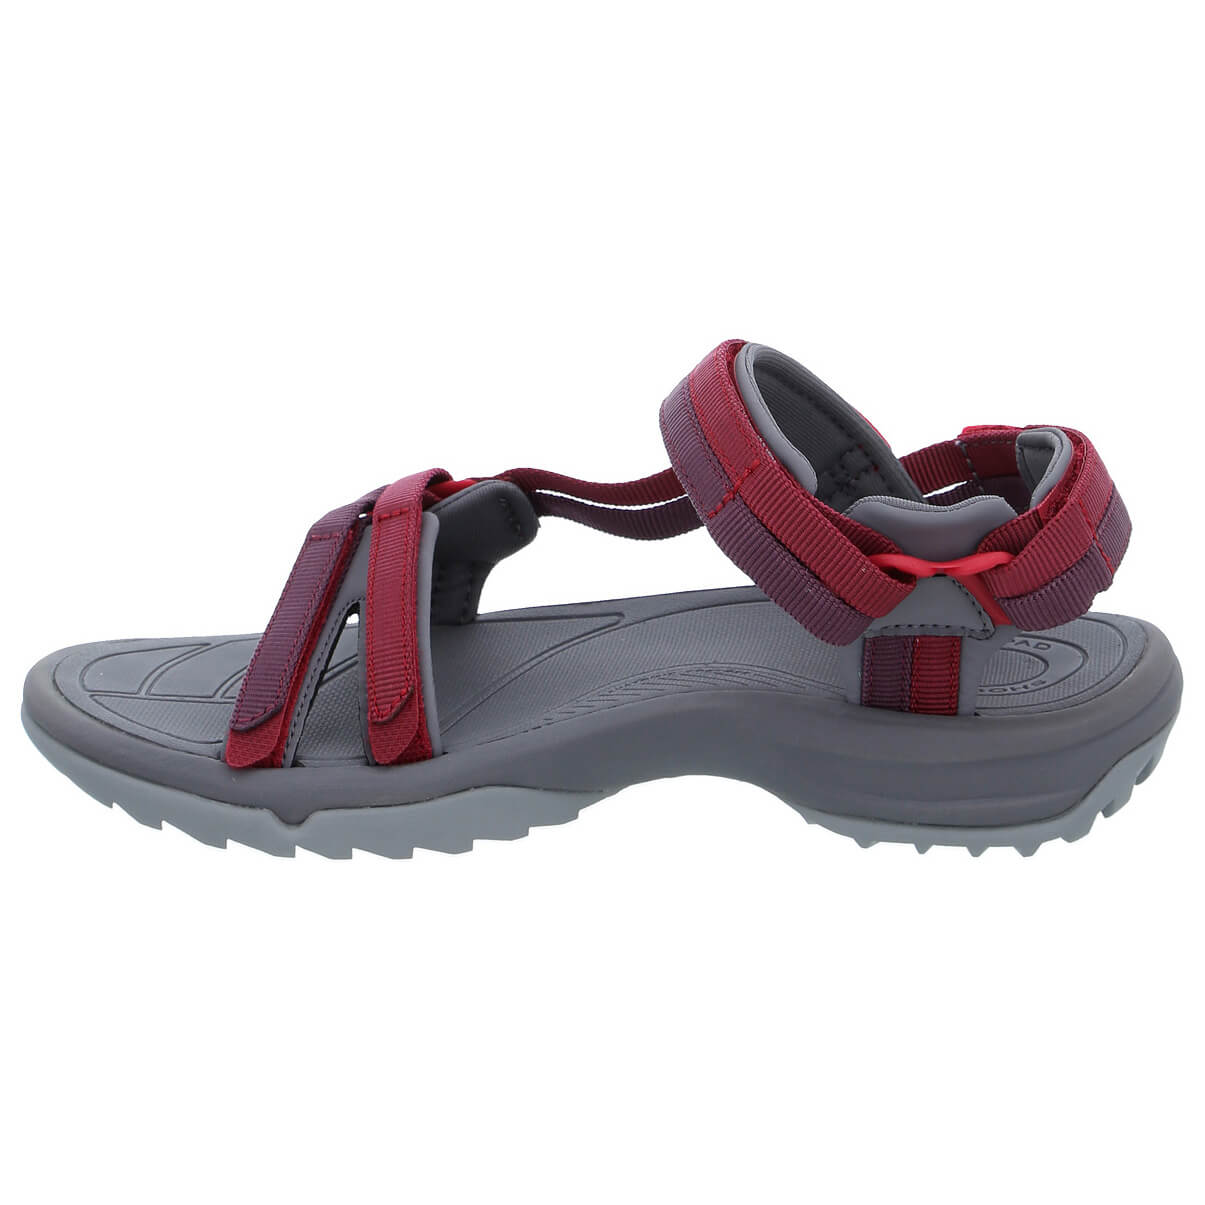 4e183f3cdf23 ... Teva - Women s Terra Fi Lite - Sandals ...